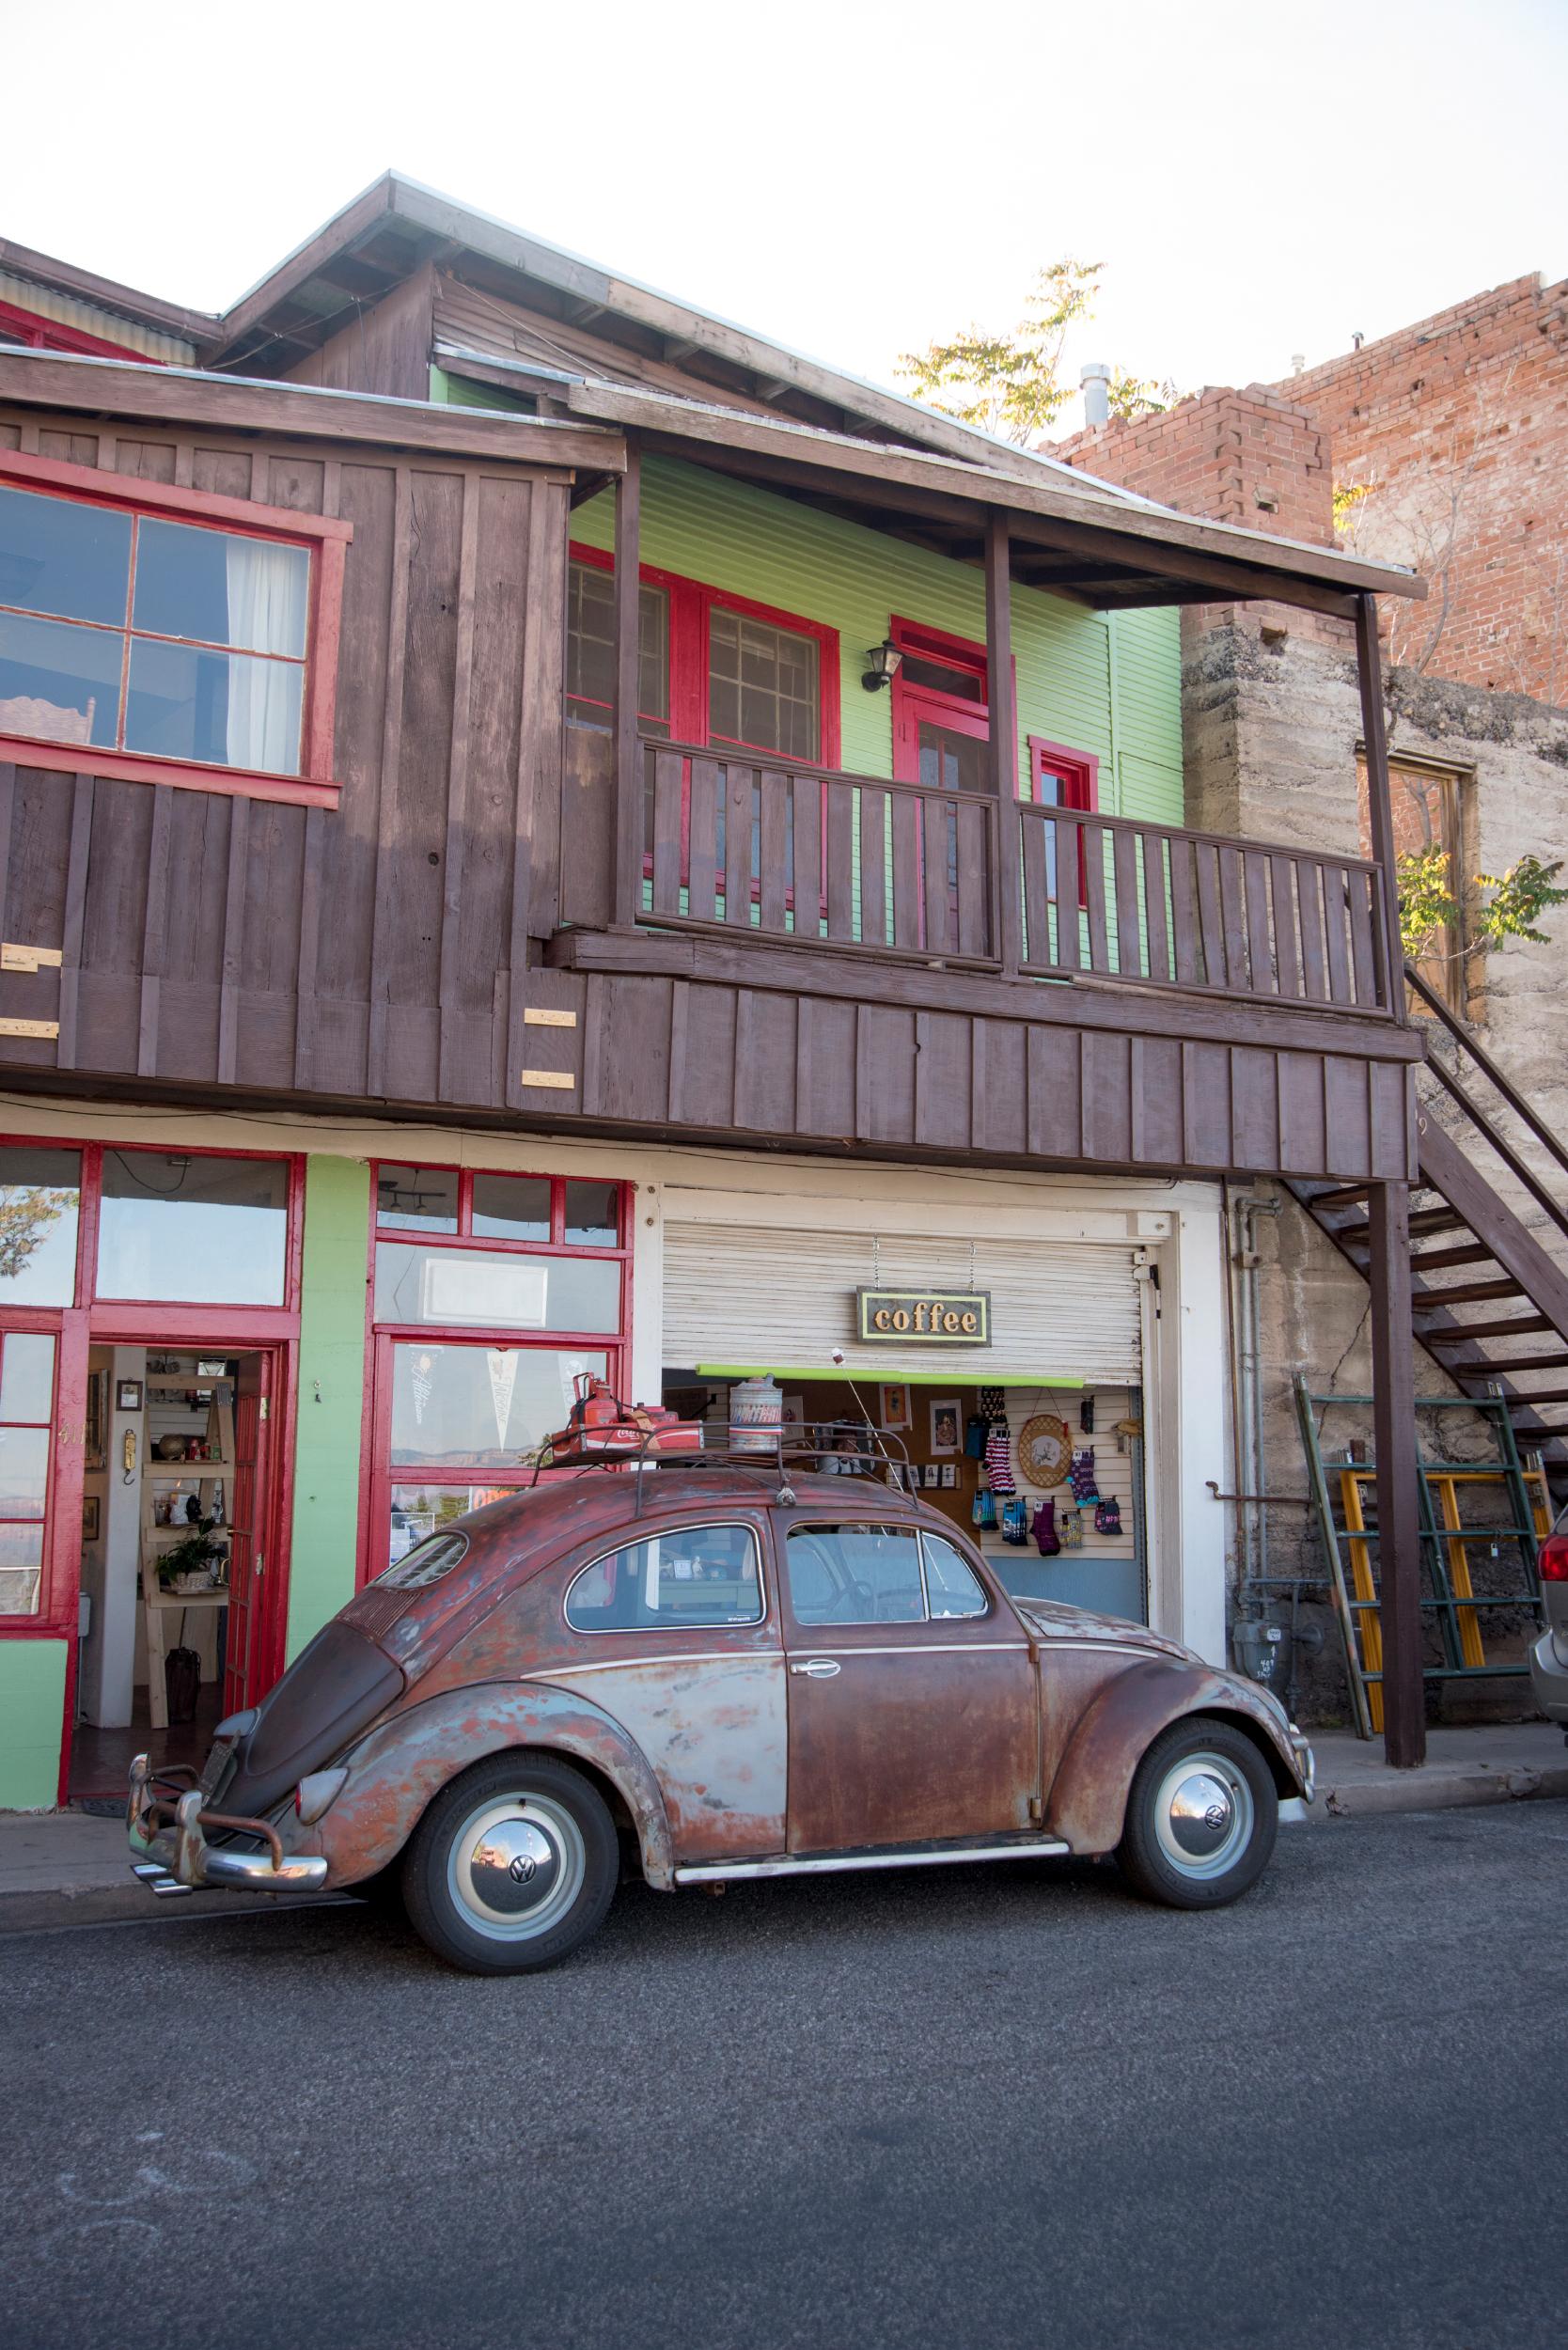 Cafe with Volkswagen